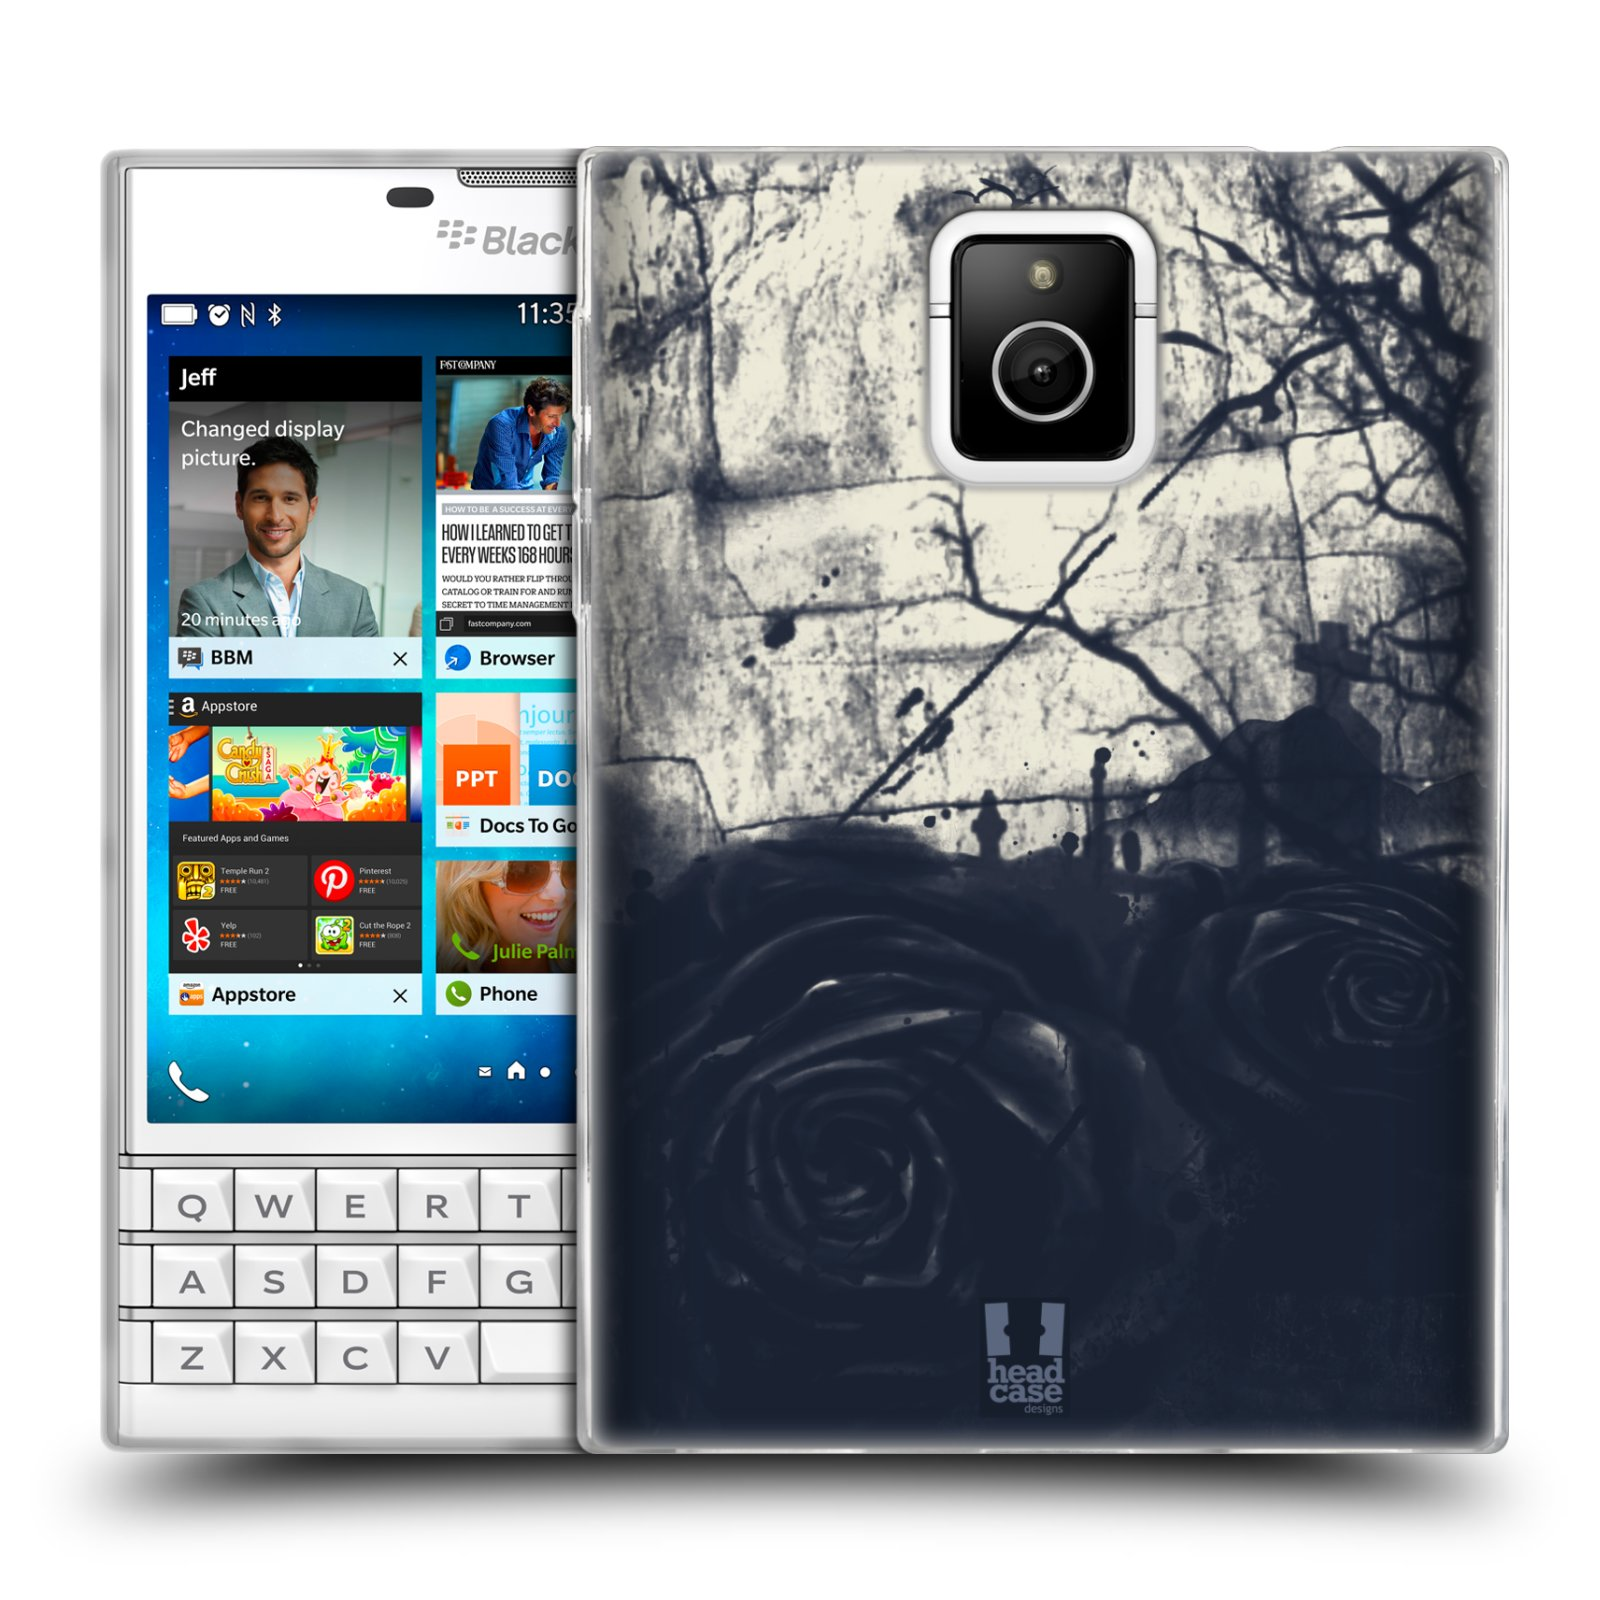 HEAD CASE silikonový obal na mobil Blackberry PASSPORT vzor Kreslené barevné květiny TEMNÁ RŮŽE